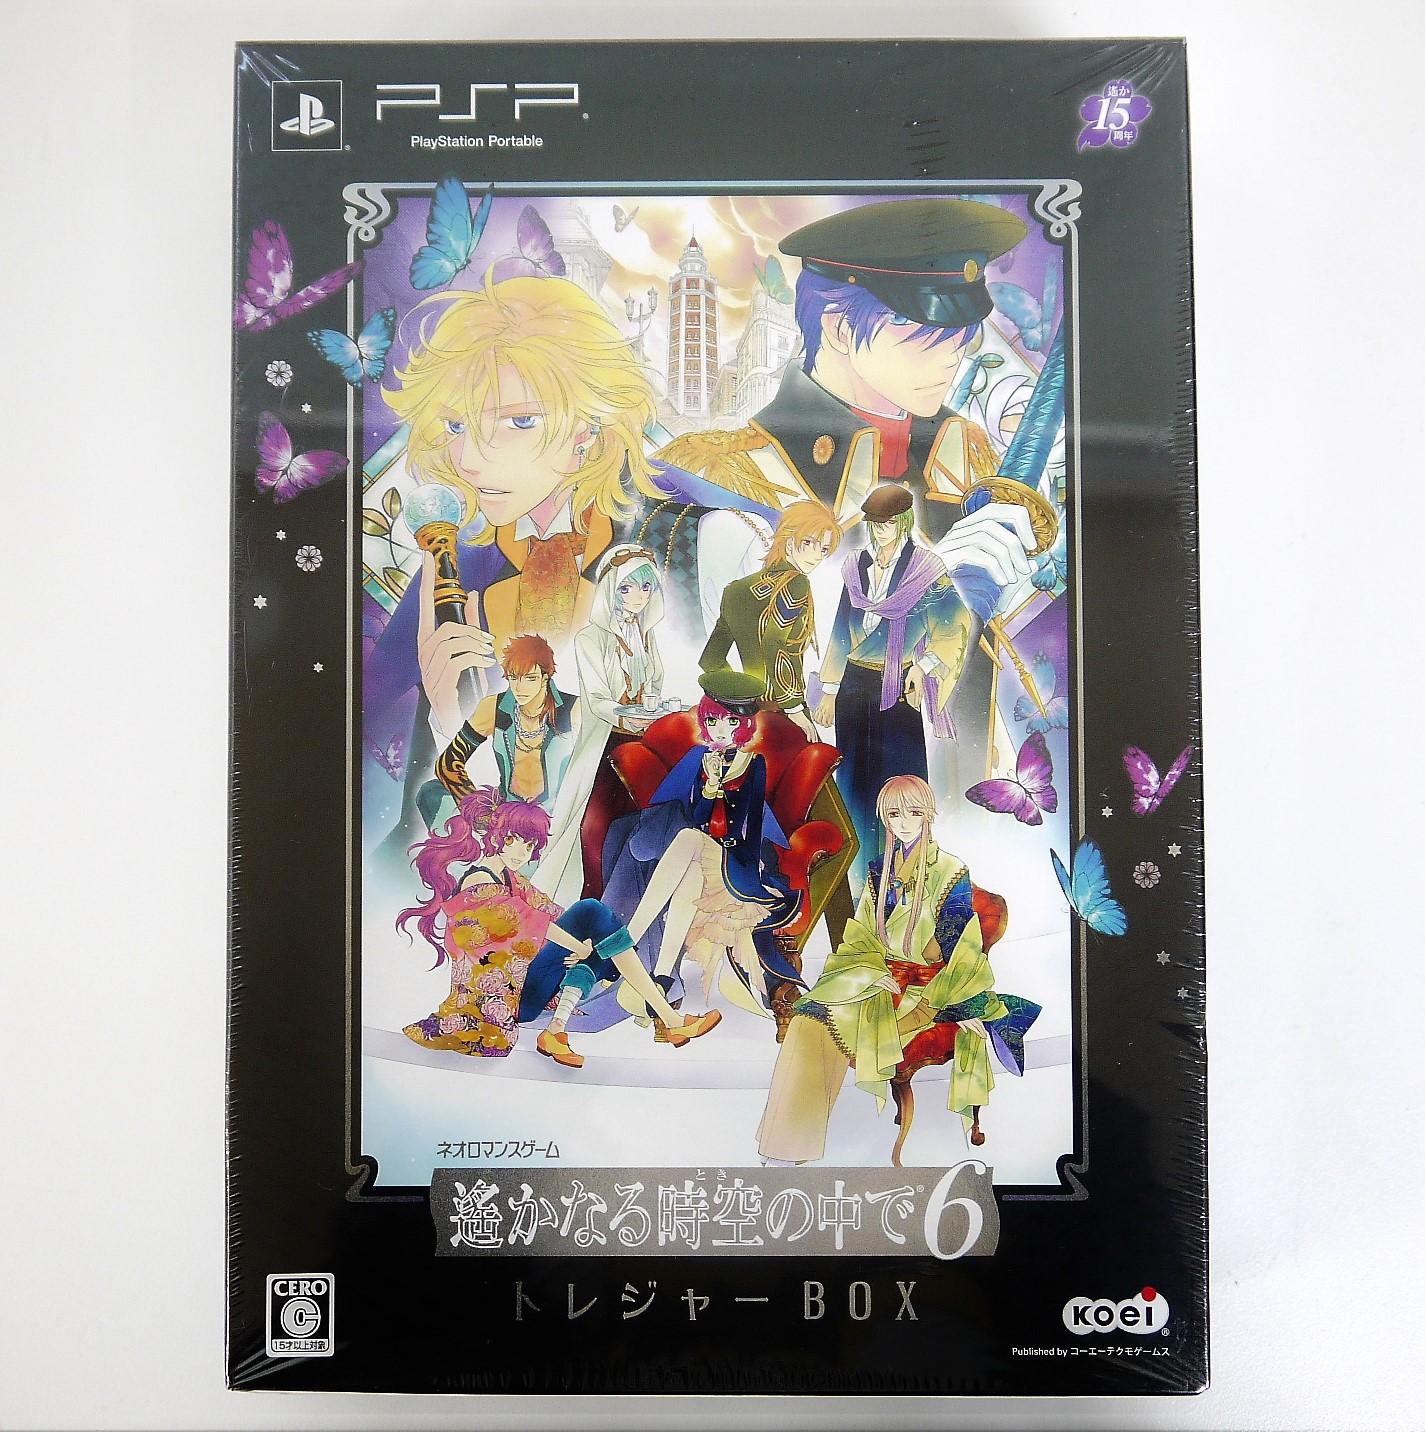 PSP 遙かなる時空の中で6 トレジャーBOX